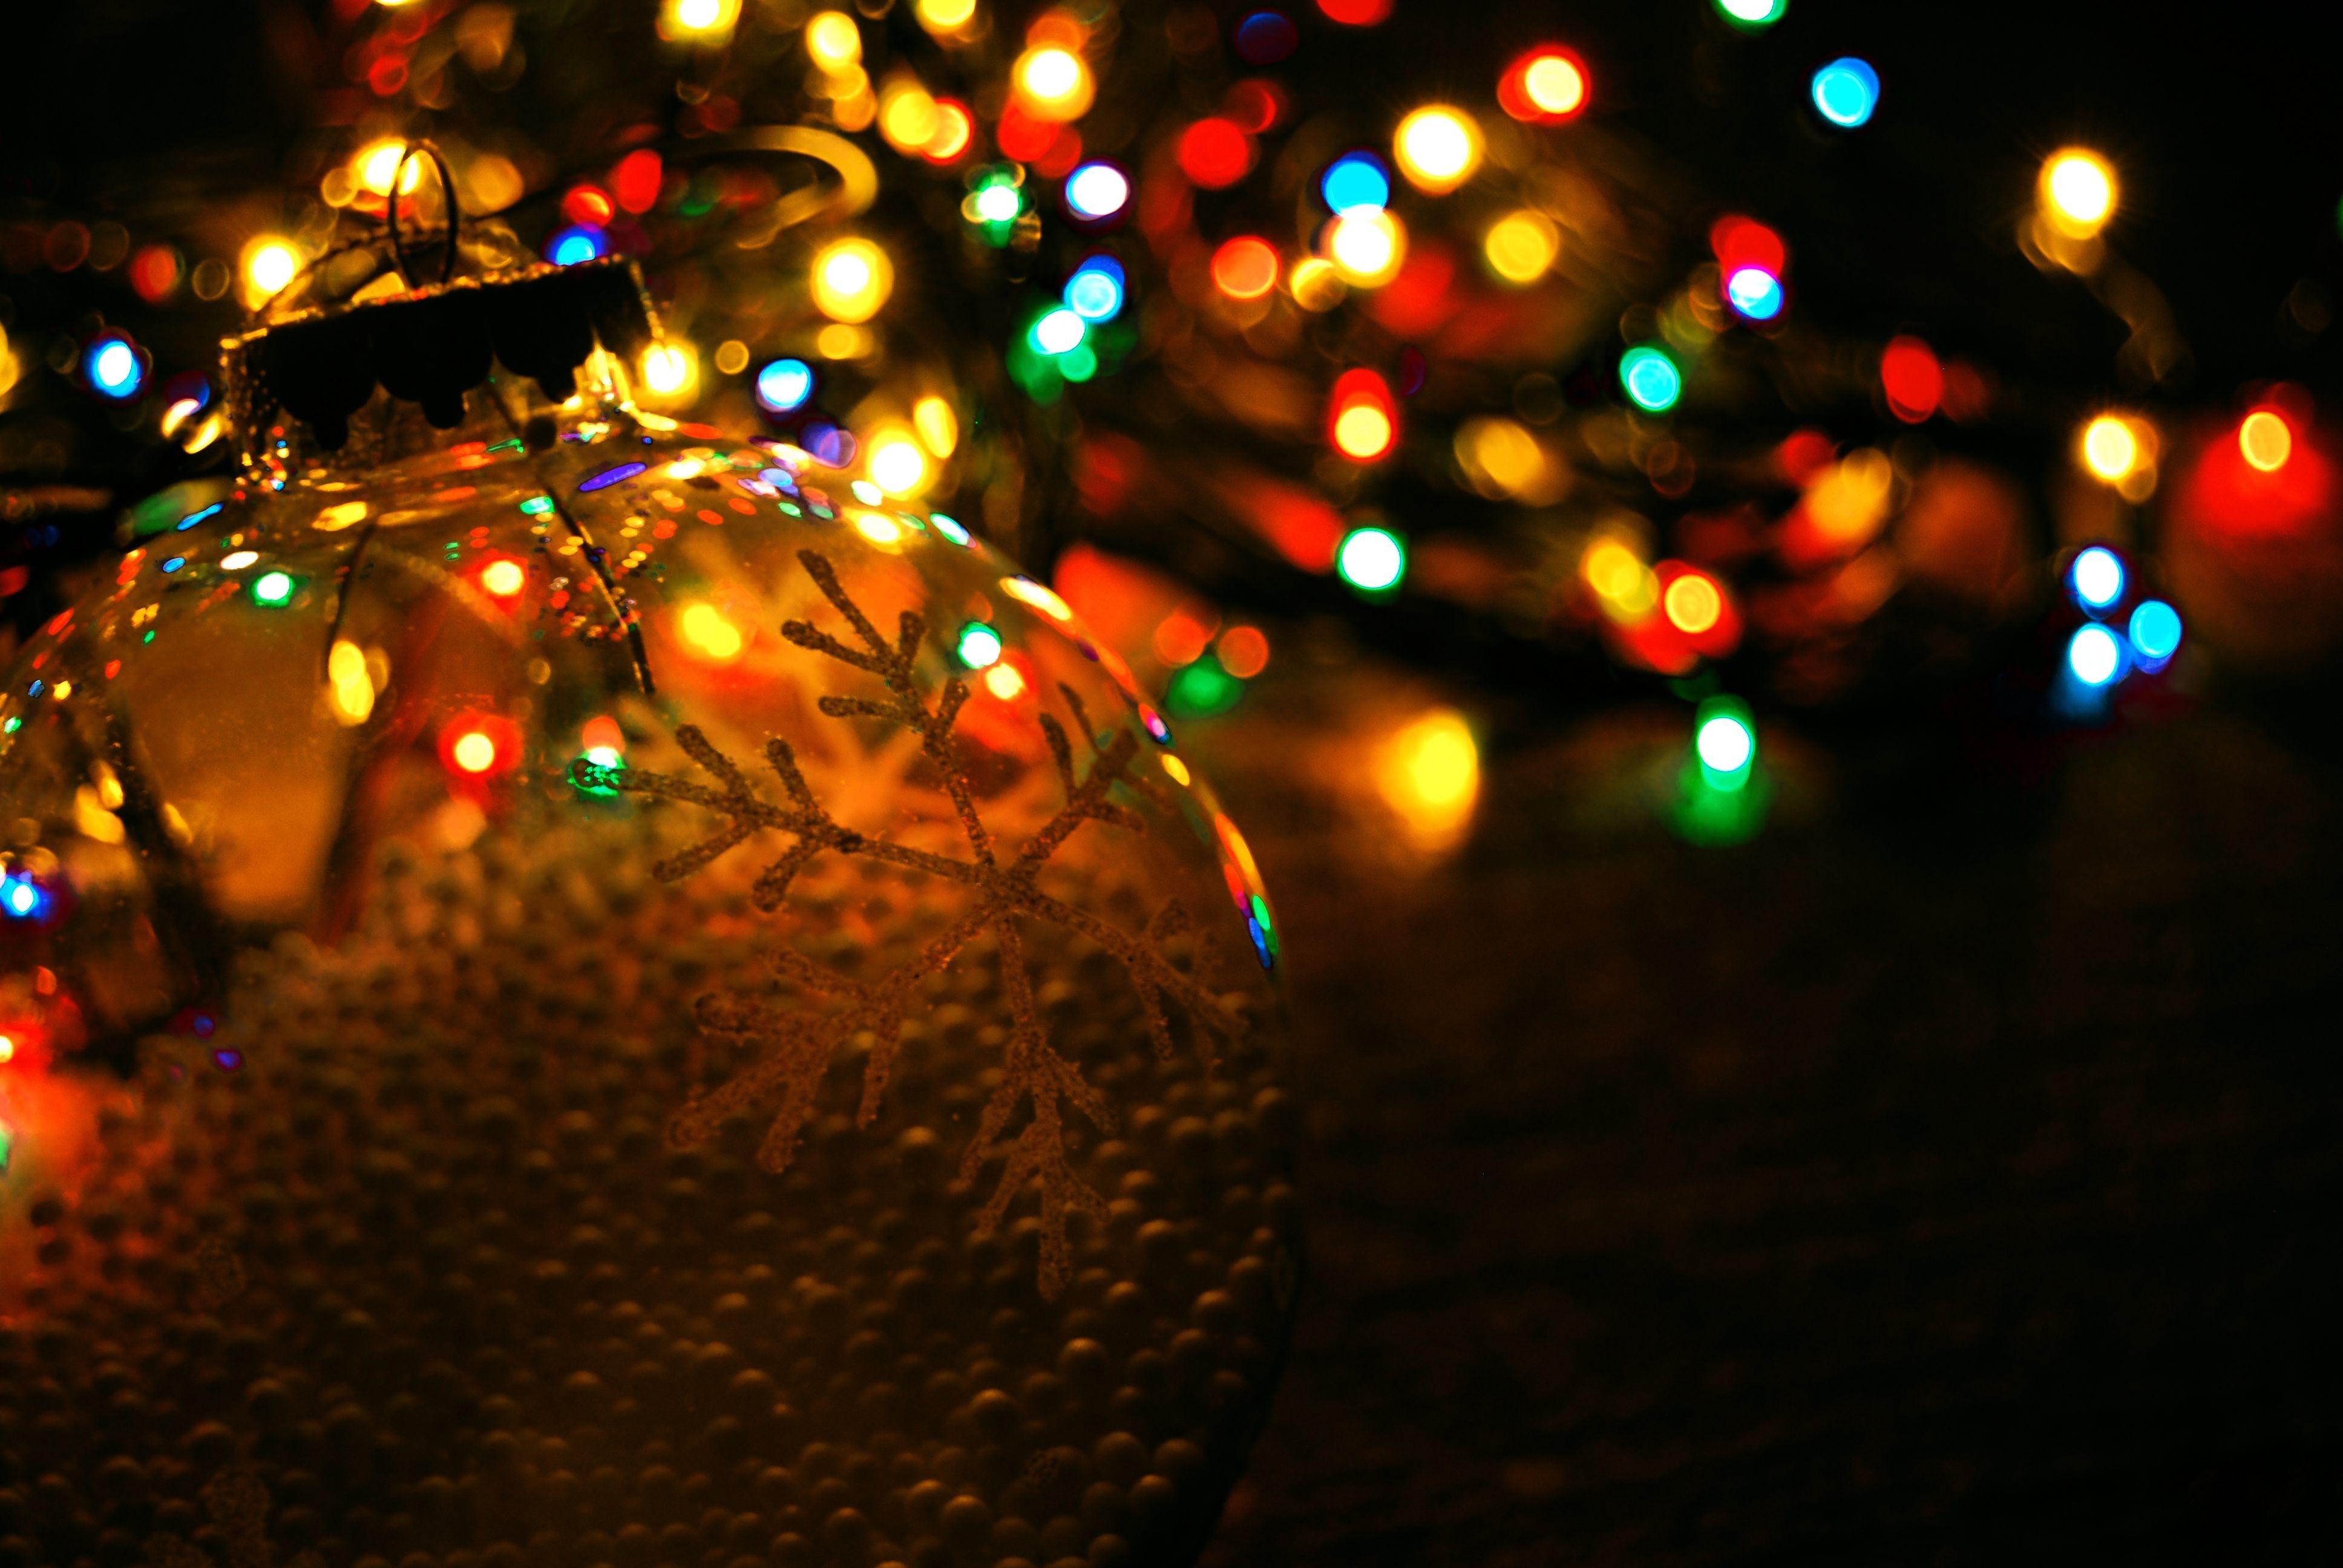 Unique Christmas Season Wallpaper Desktop Christmas Desktop Christmas Desktop Wallpaper Christmas Lights Wallpaper Desktop christmas wallpaper hd